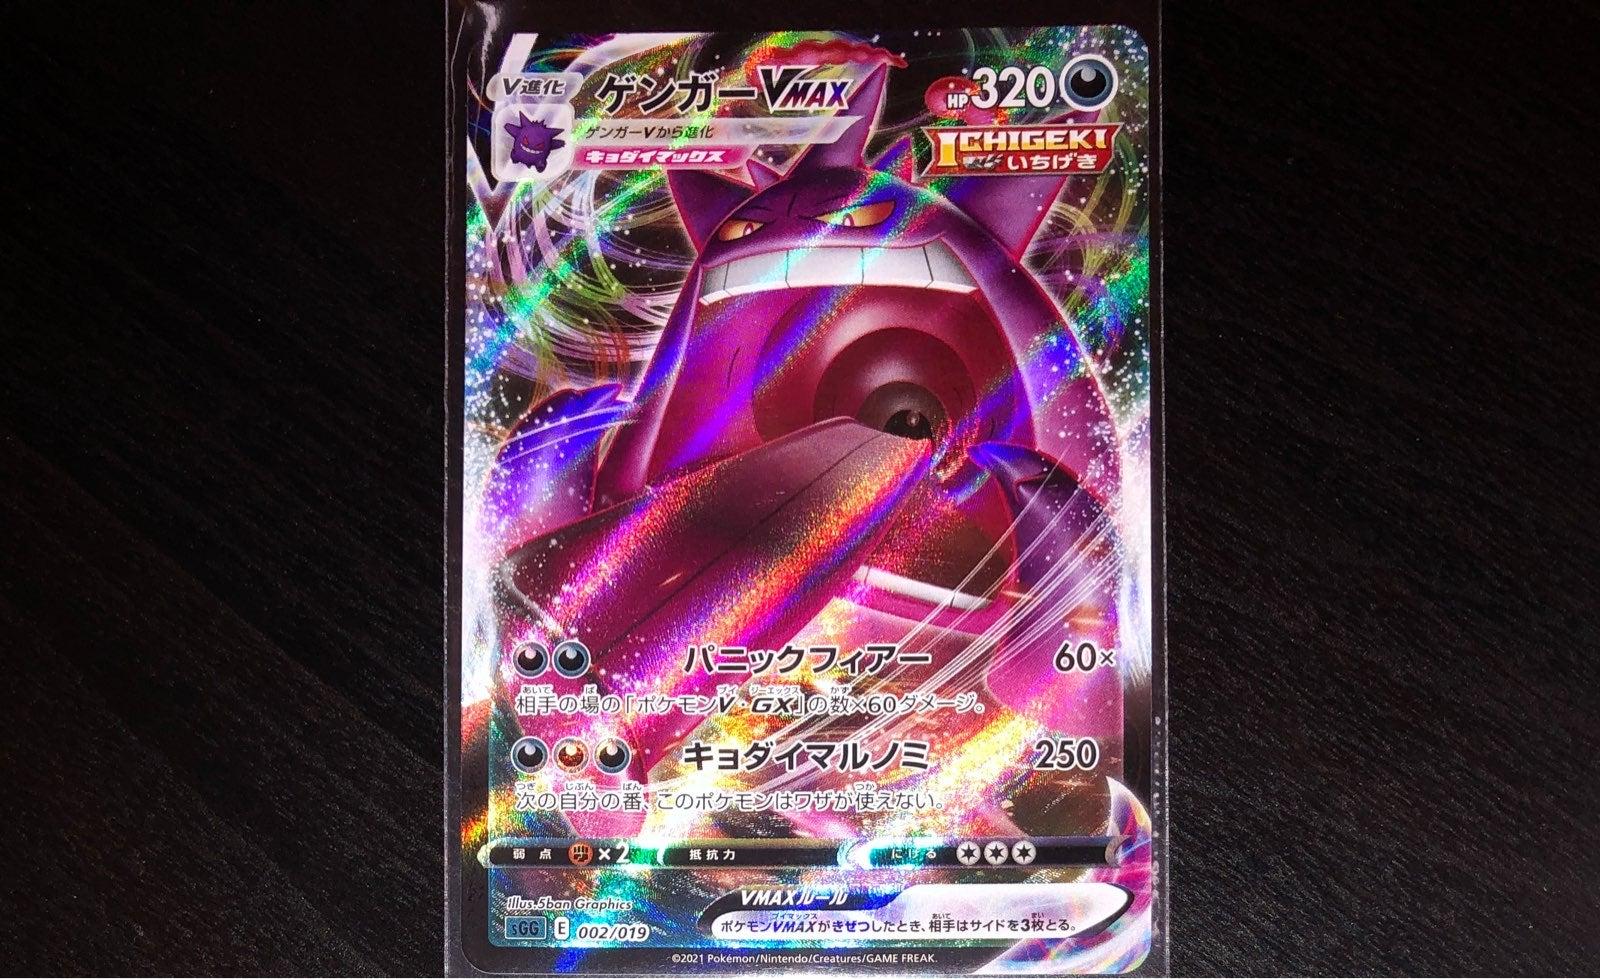 Gengar Vmax Full Art Ichigeki Deck Promo